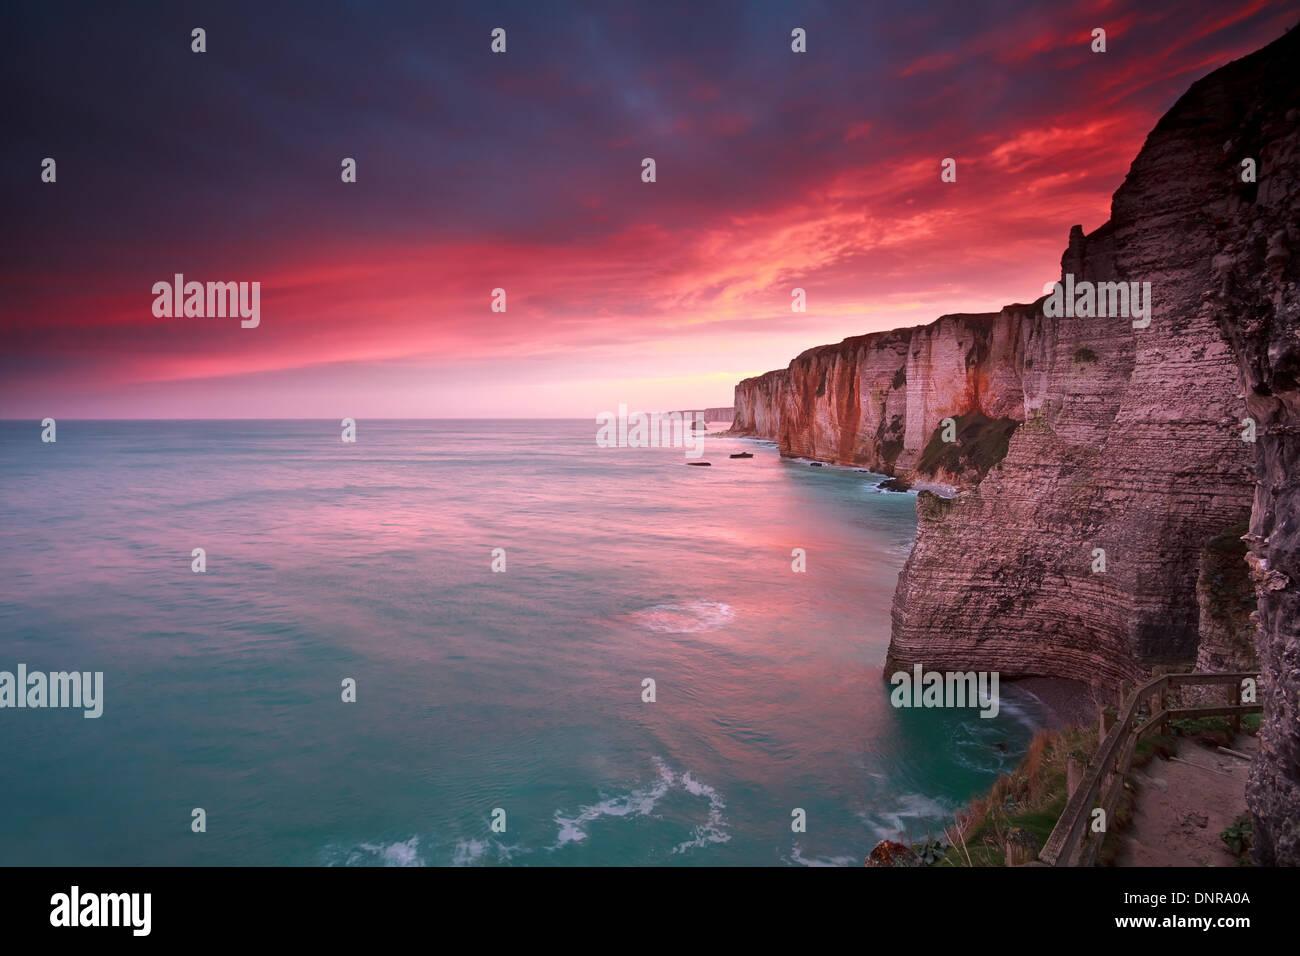 dramatic sunrise over ocean and cliffs, Etretat, France - Stock Image